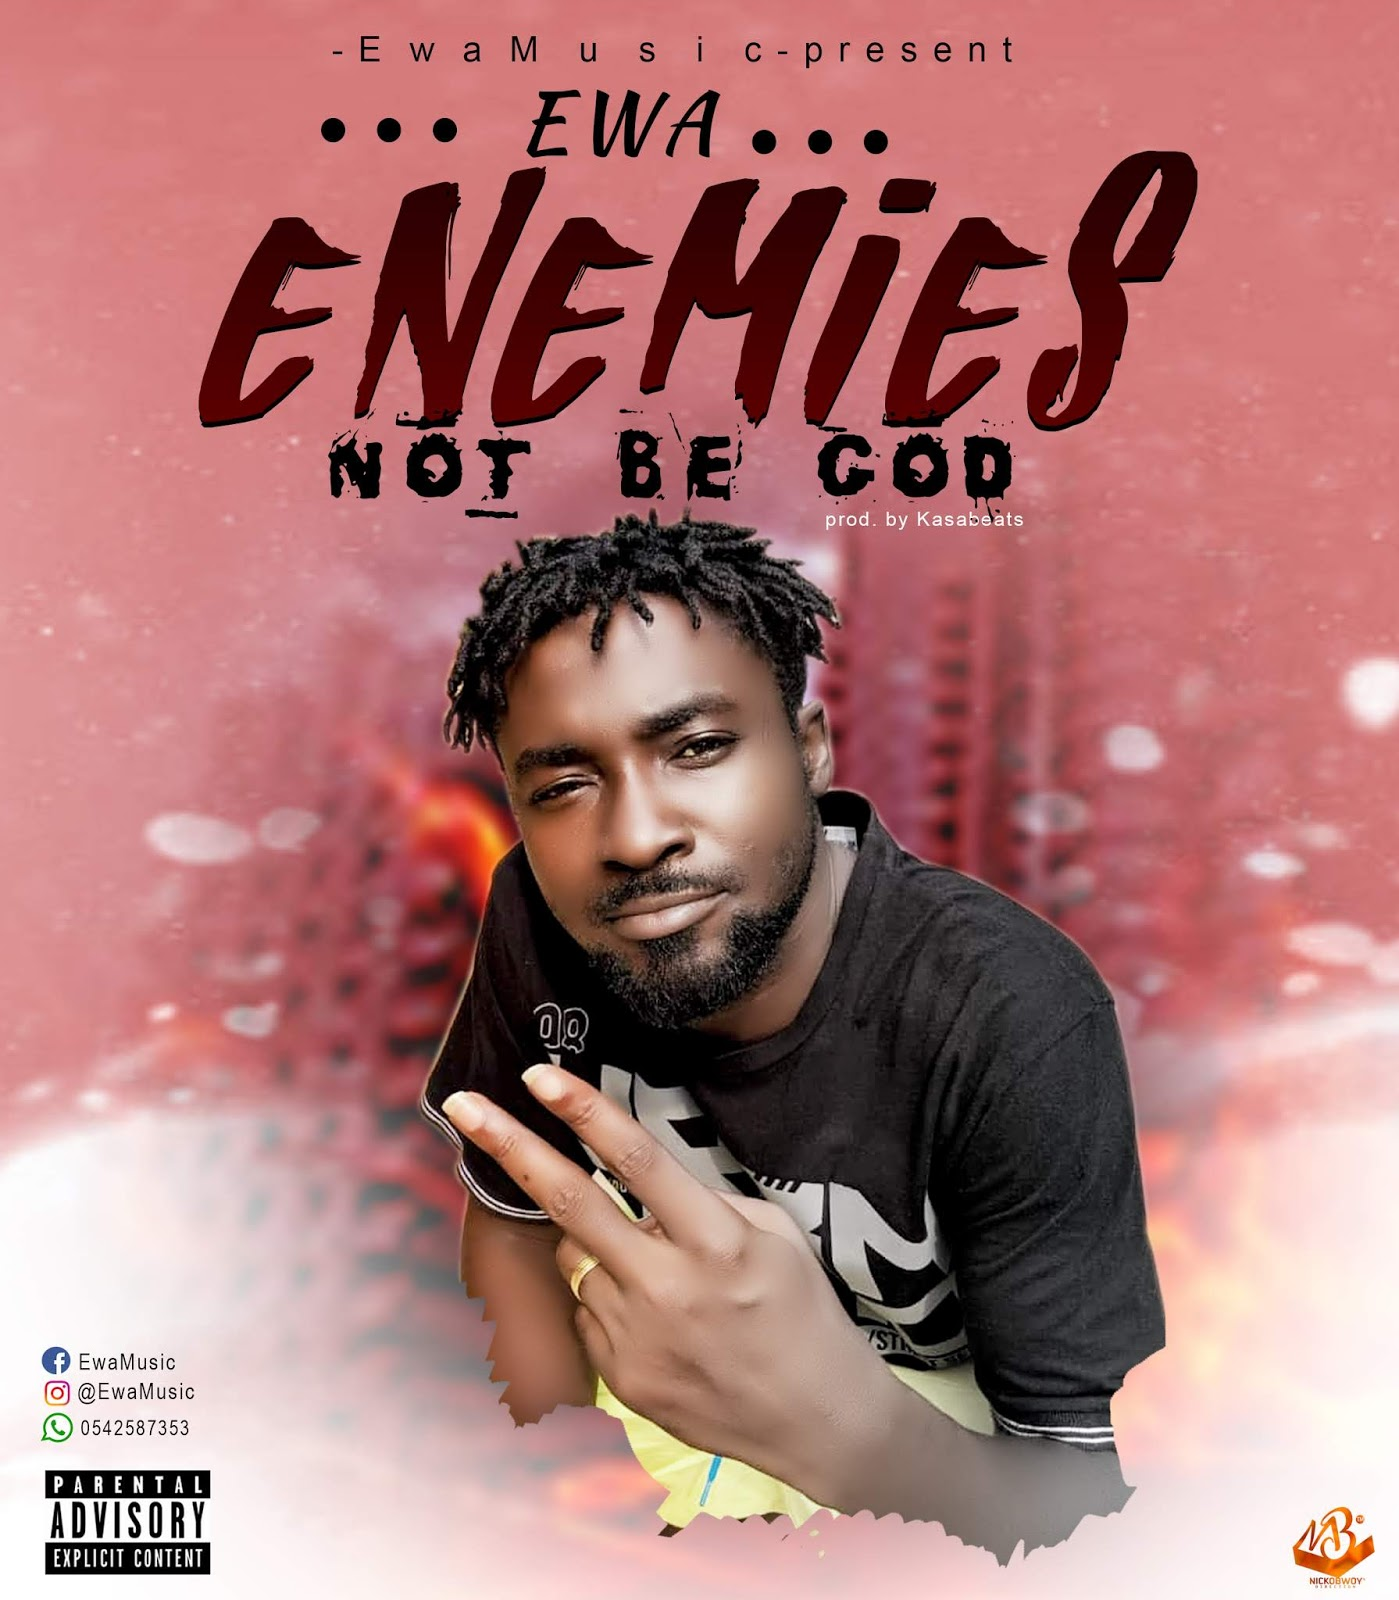 Download Song: Ewa - Enemies not be God (Produced. By Kasapa Beatz). Mp3